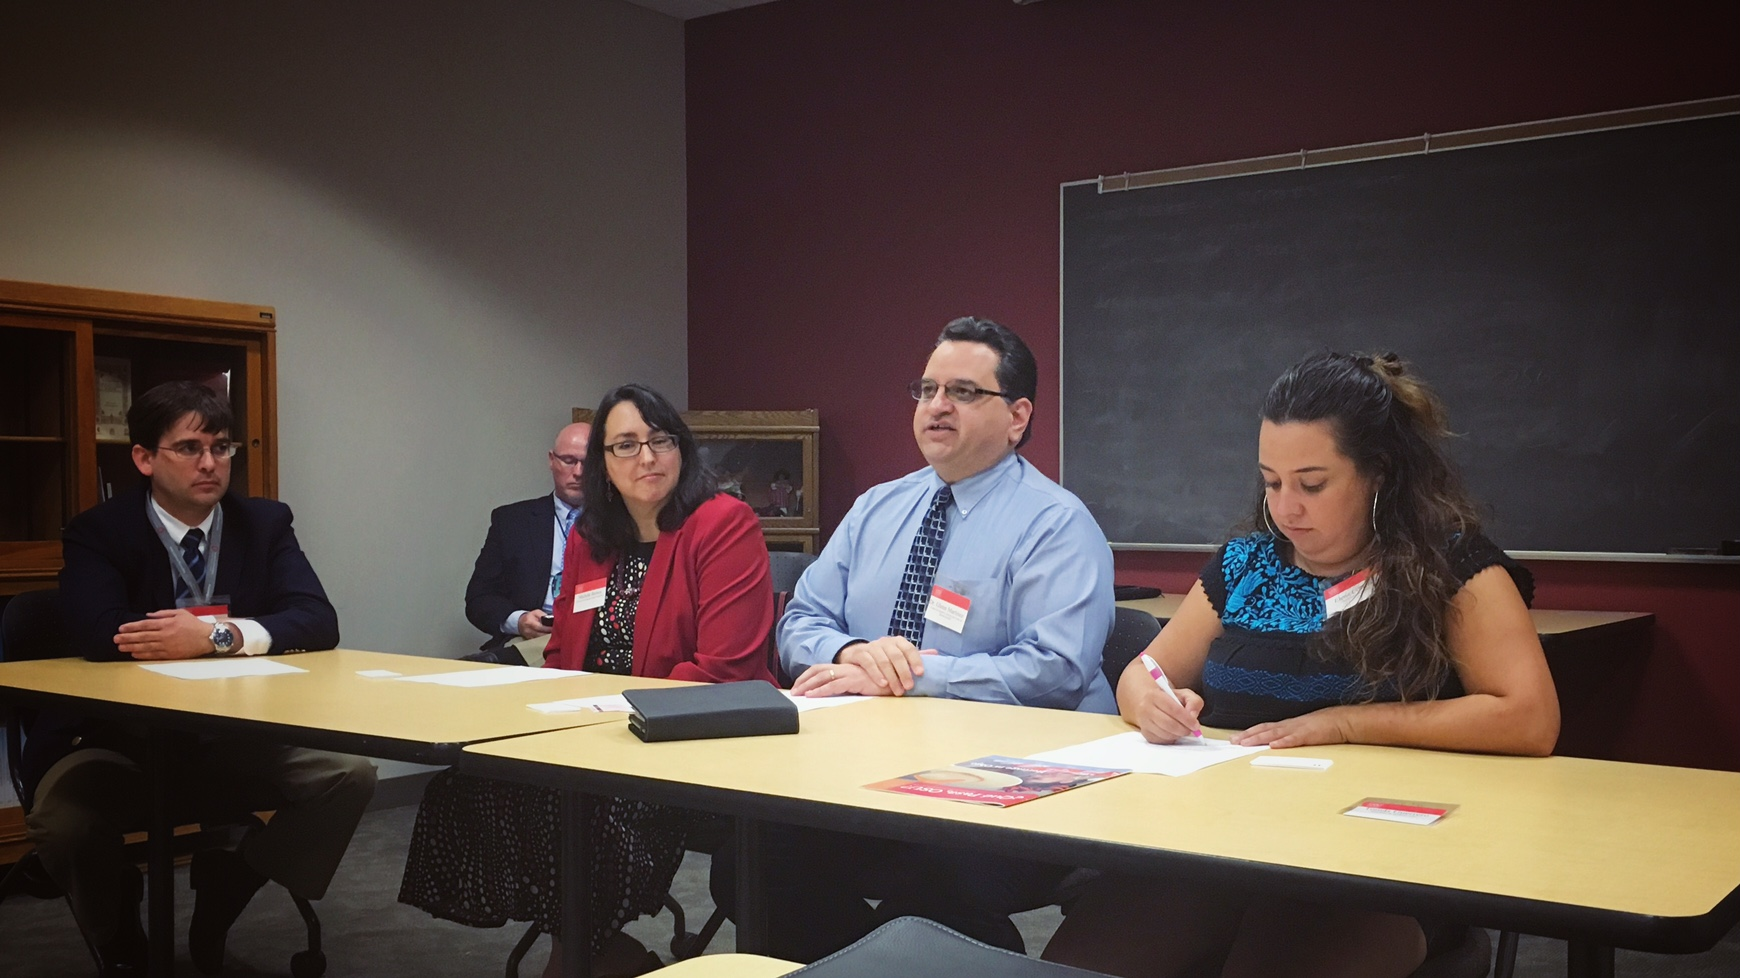 IMPACT Event at Ohio State University